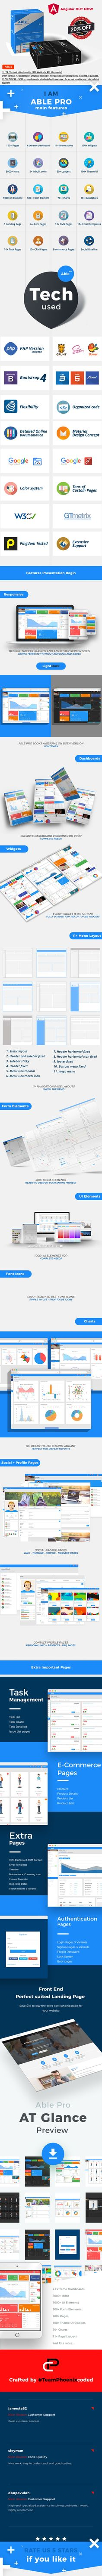 Bootstrap 4 Admin Template | Dashboard template